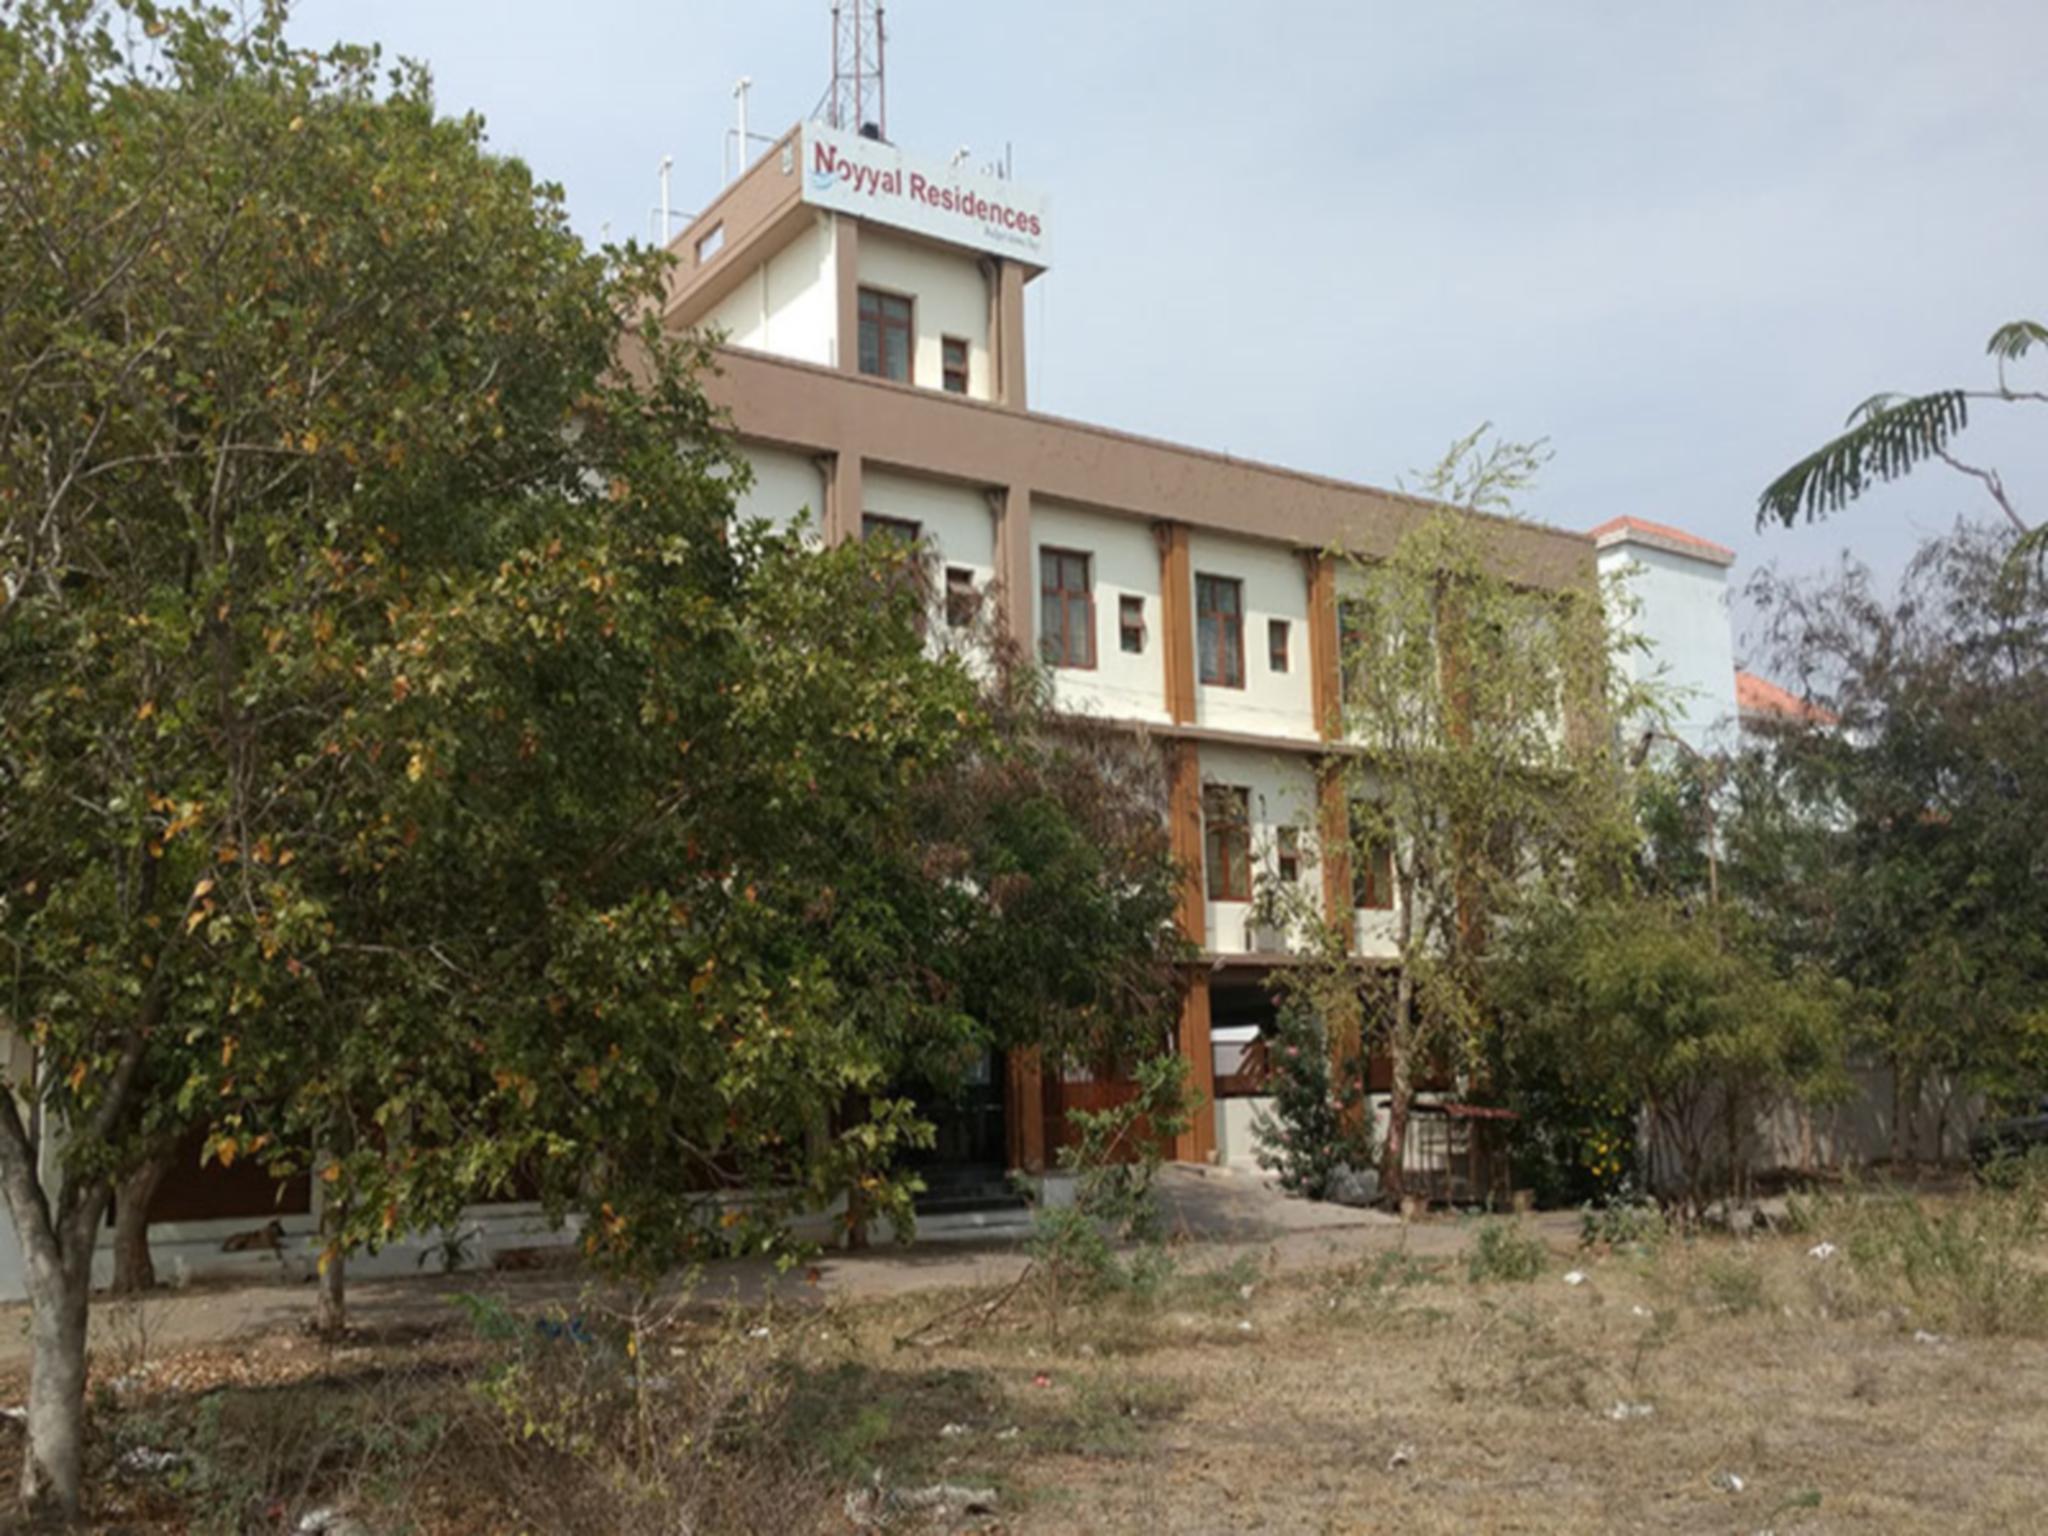 Noyyal Residences